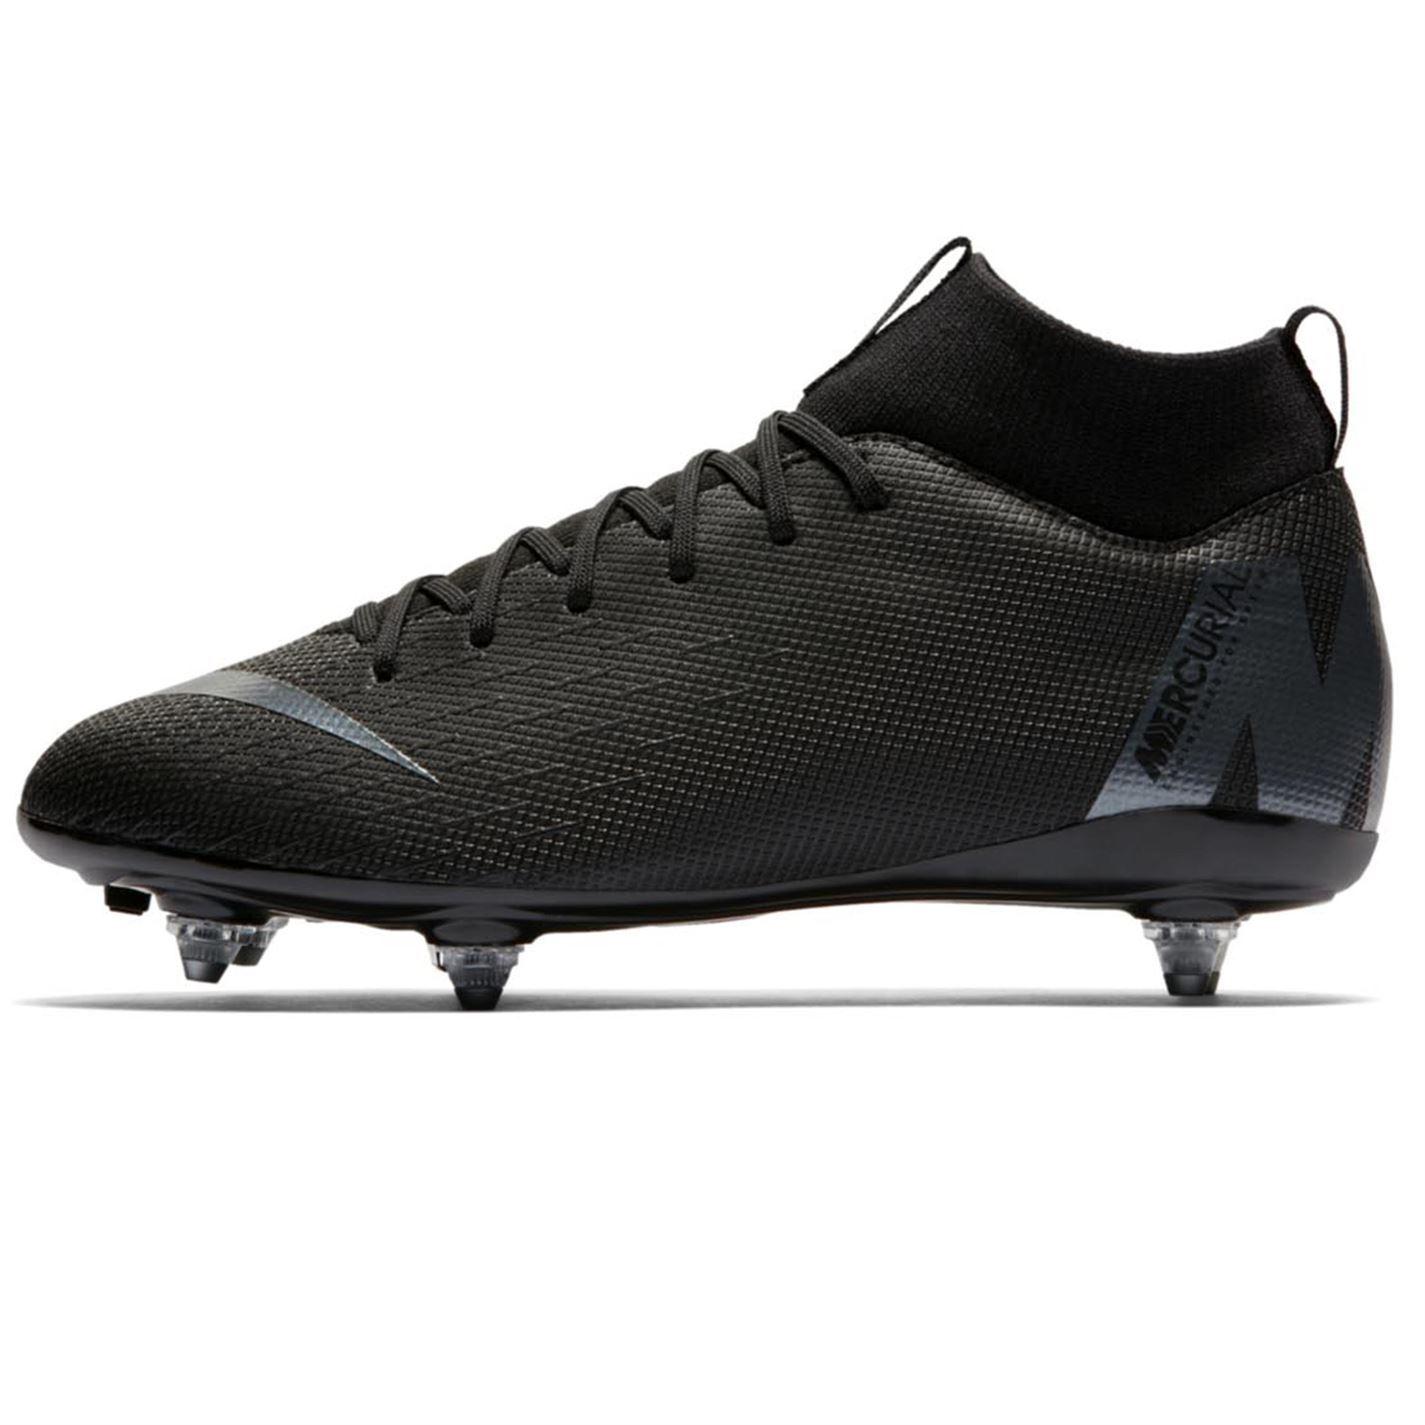 936396a6e Nike Mercurial Superfly Academy Soft Ground Football Boots Juniors ...